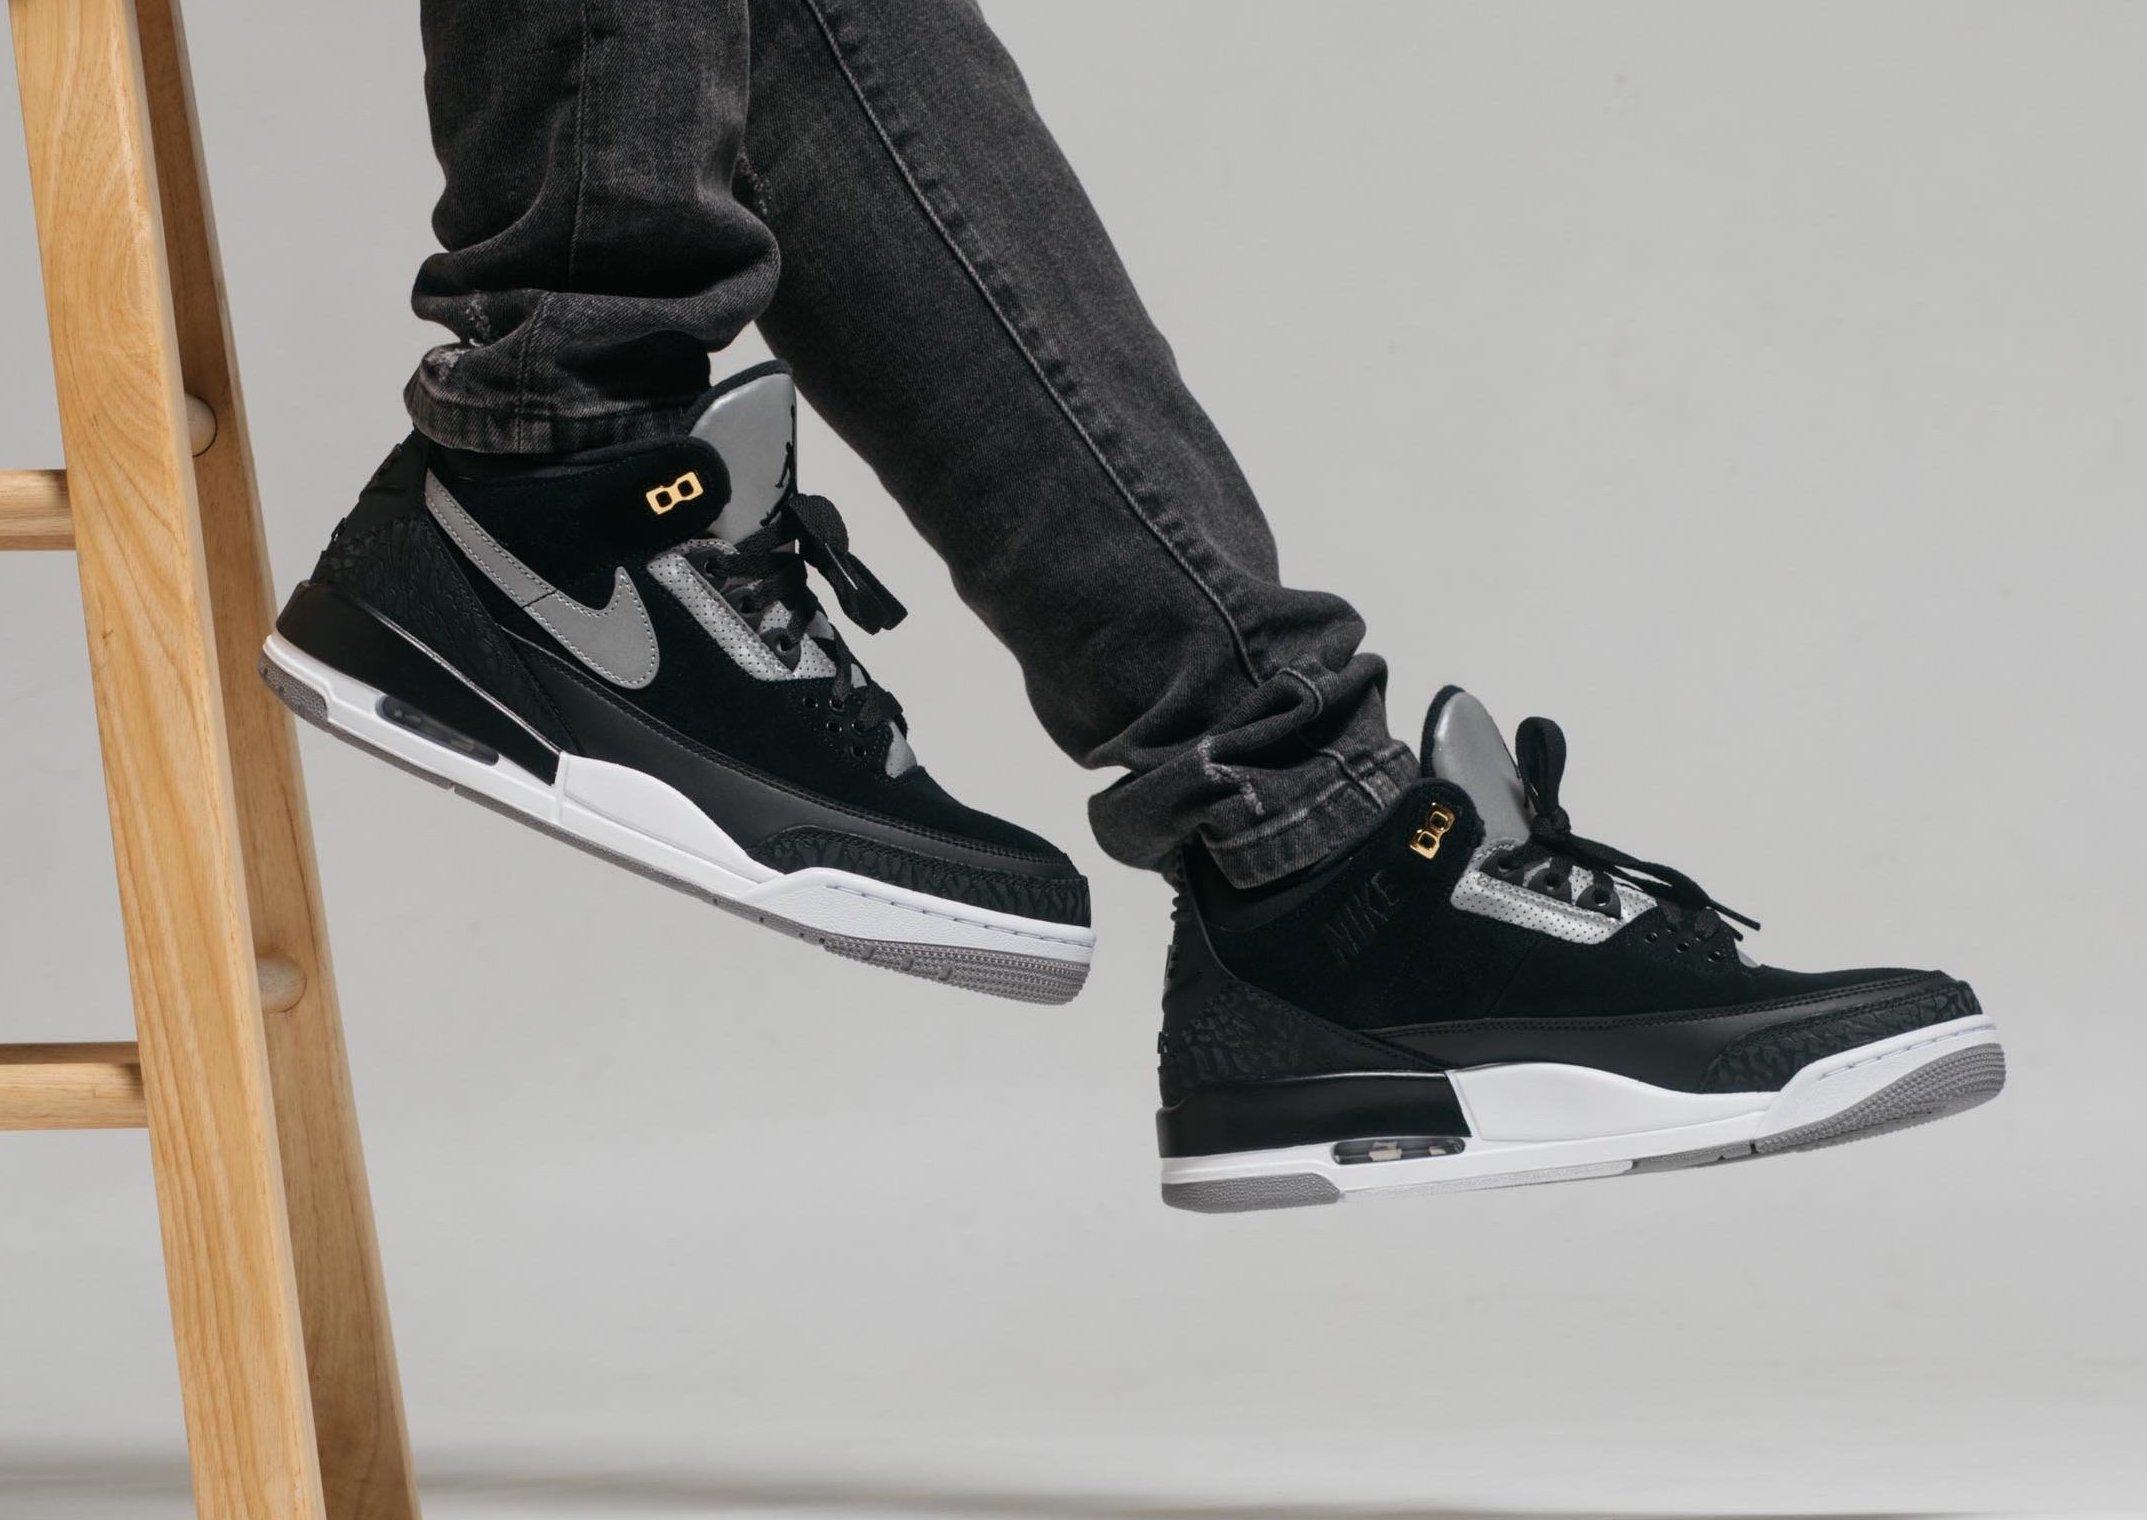 Air Jordan 3 'Tinker' Release Date. Nike SNKRS